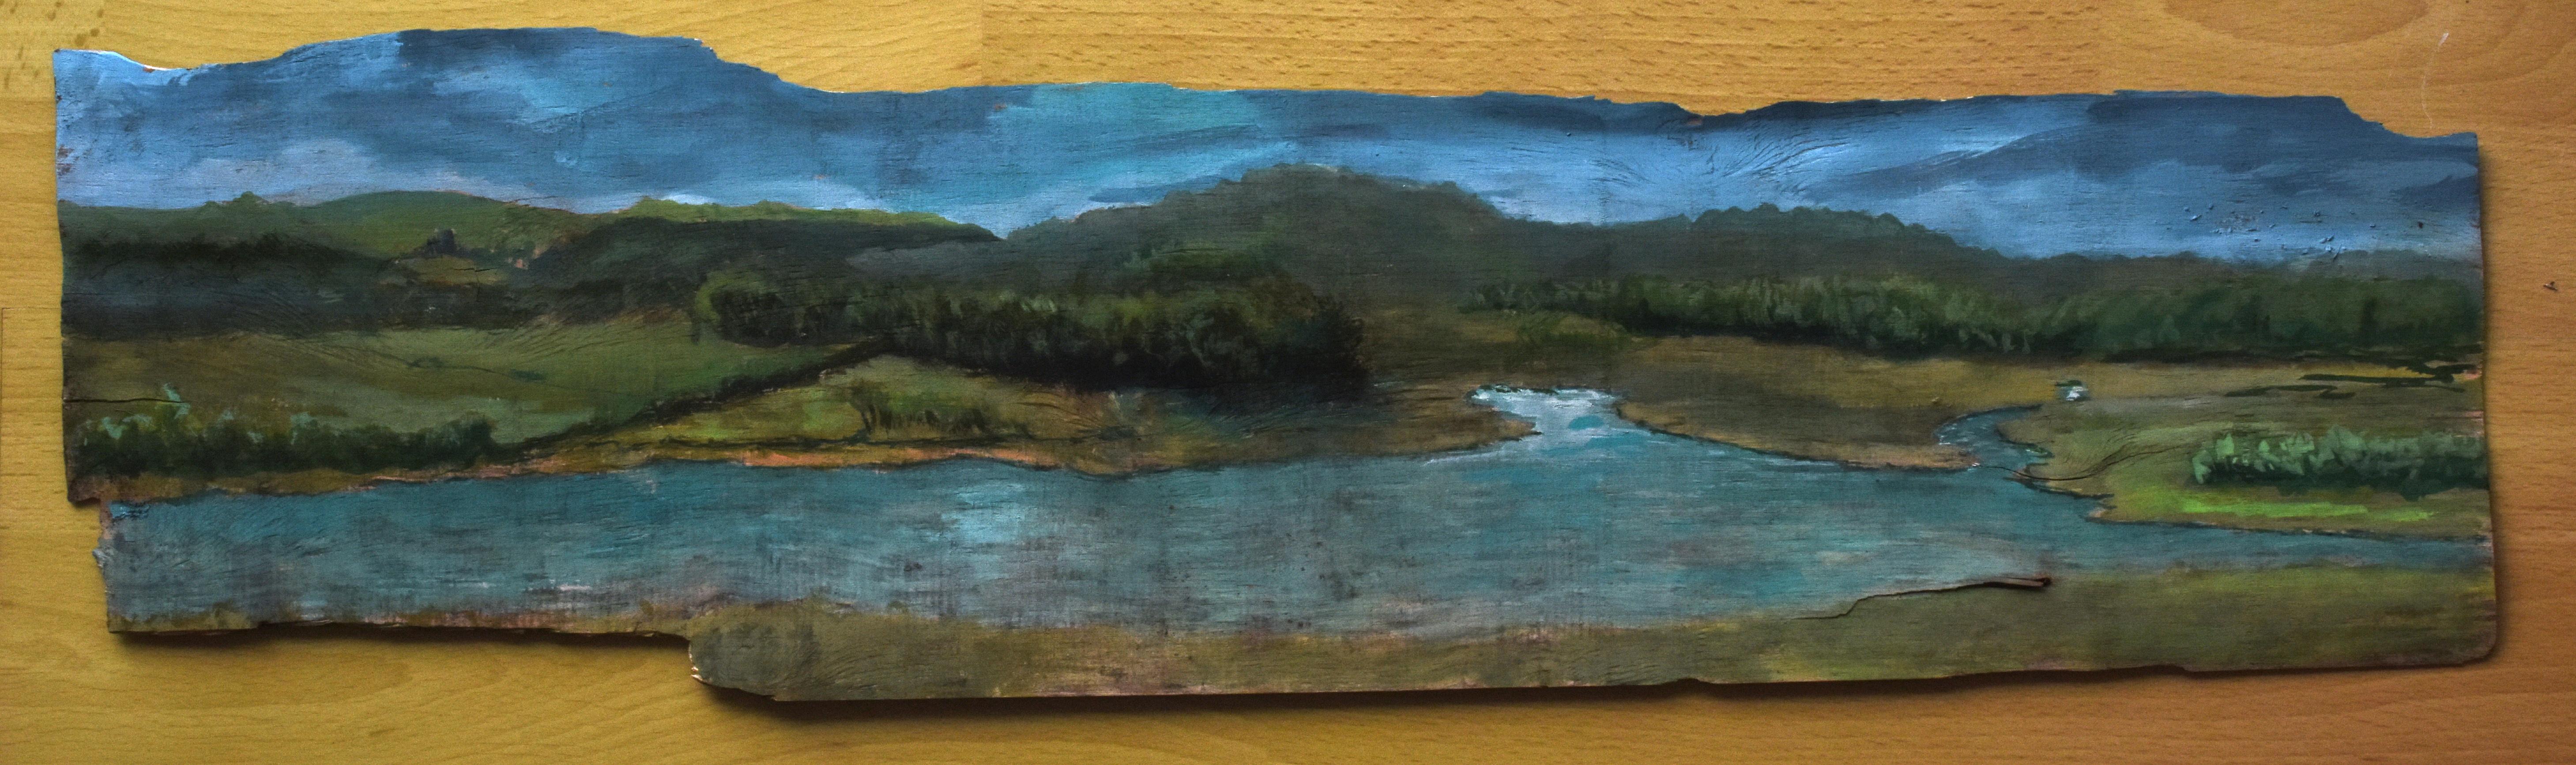 Arne panorama on wood II